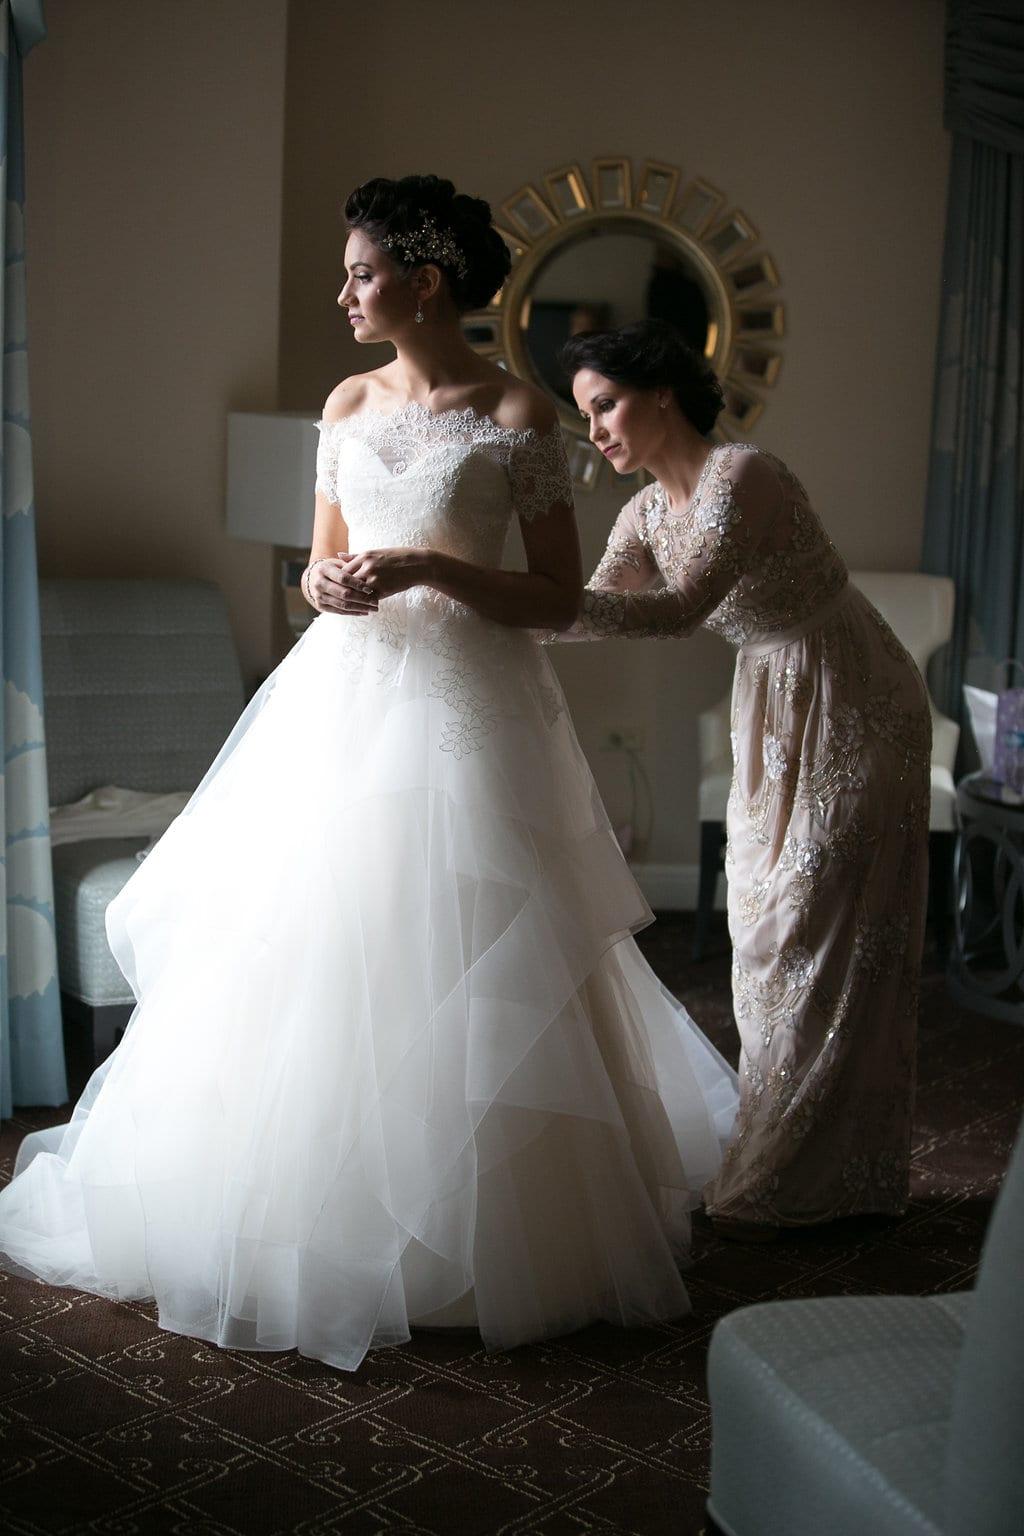 apriljeffwedding 3178 - Premier W.E.D.